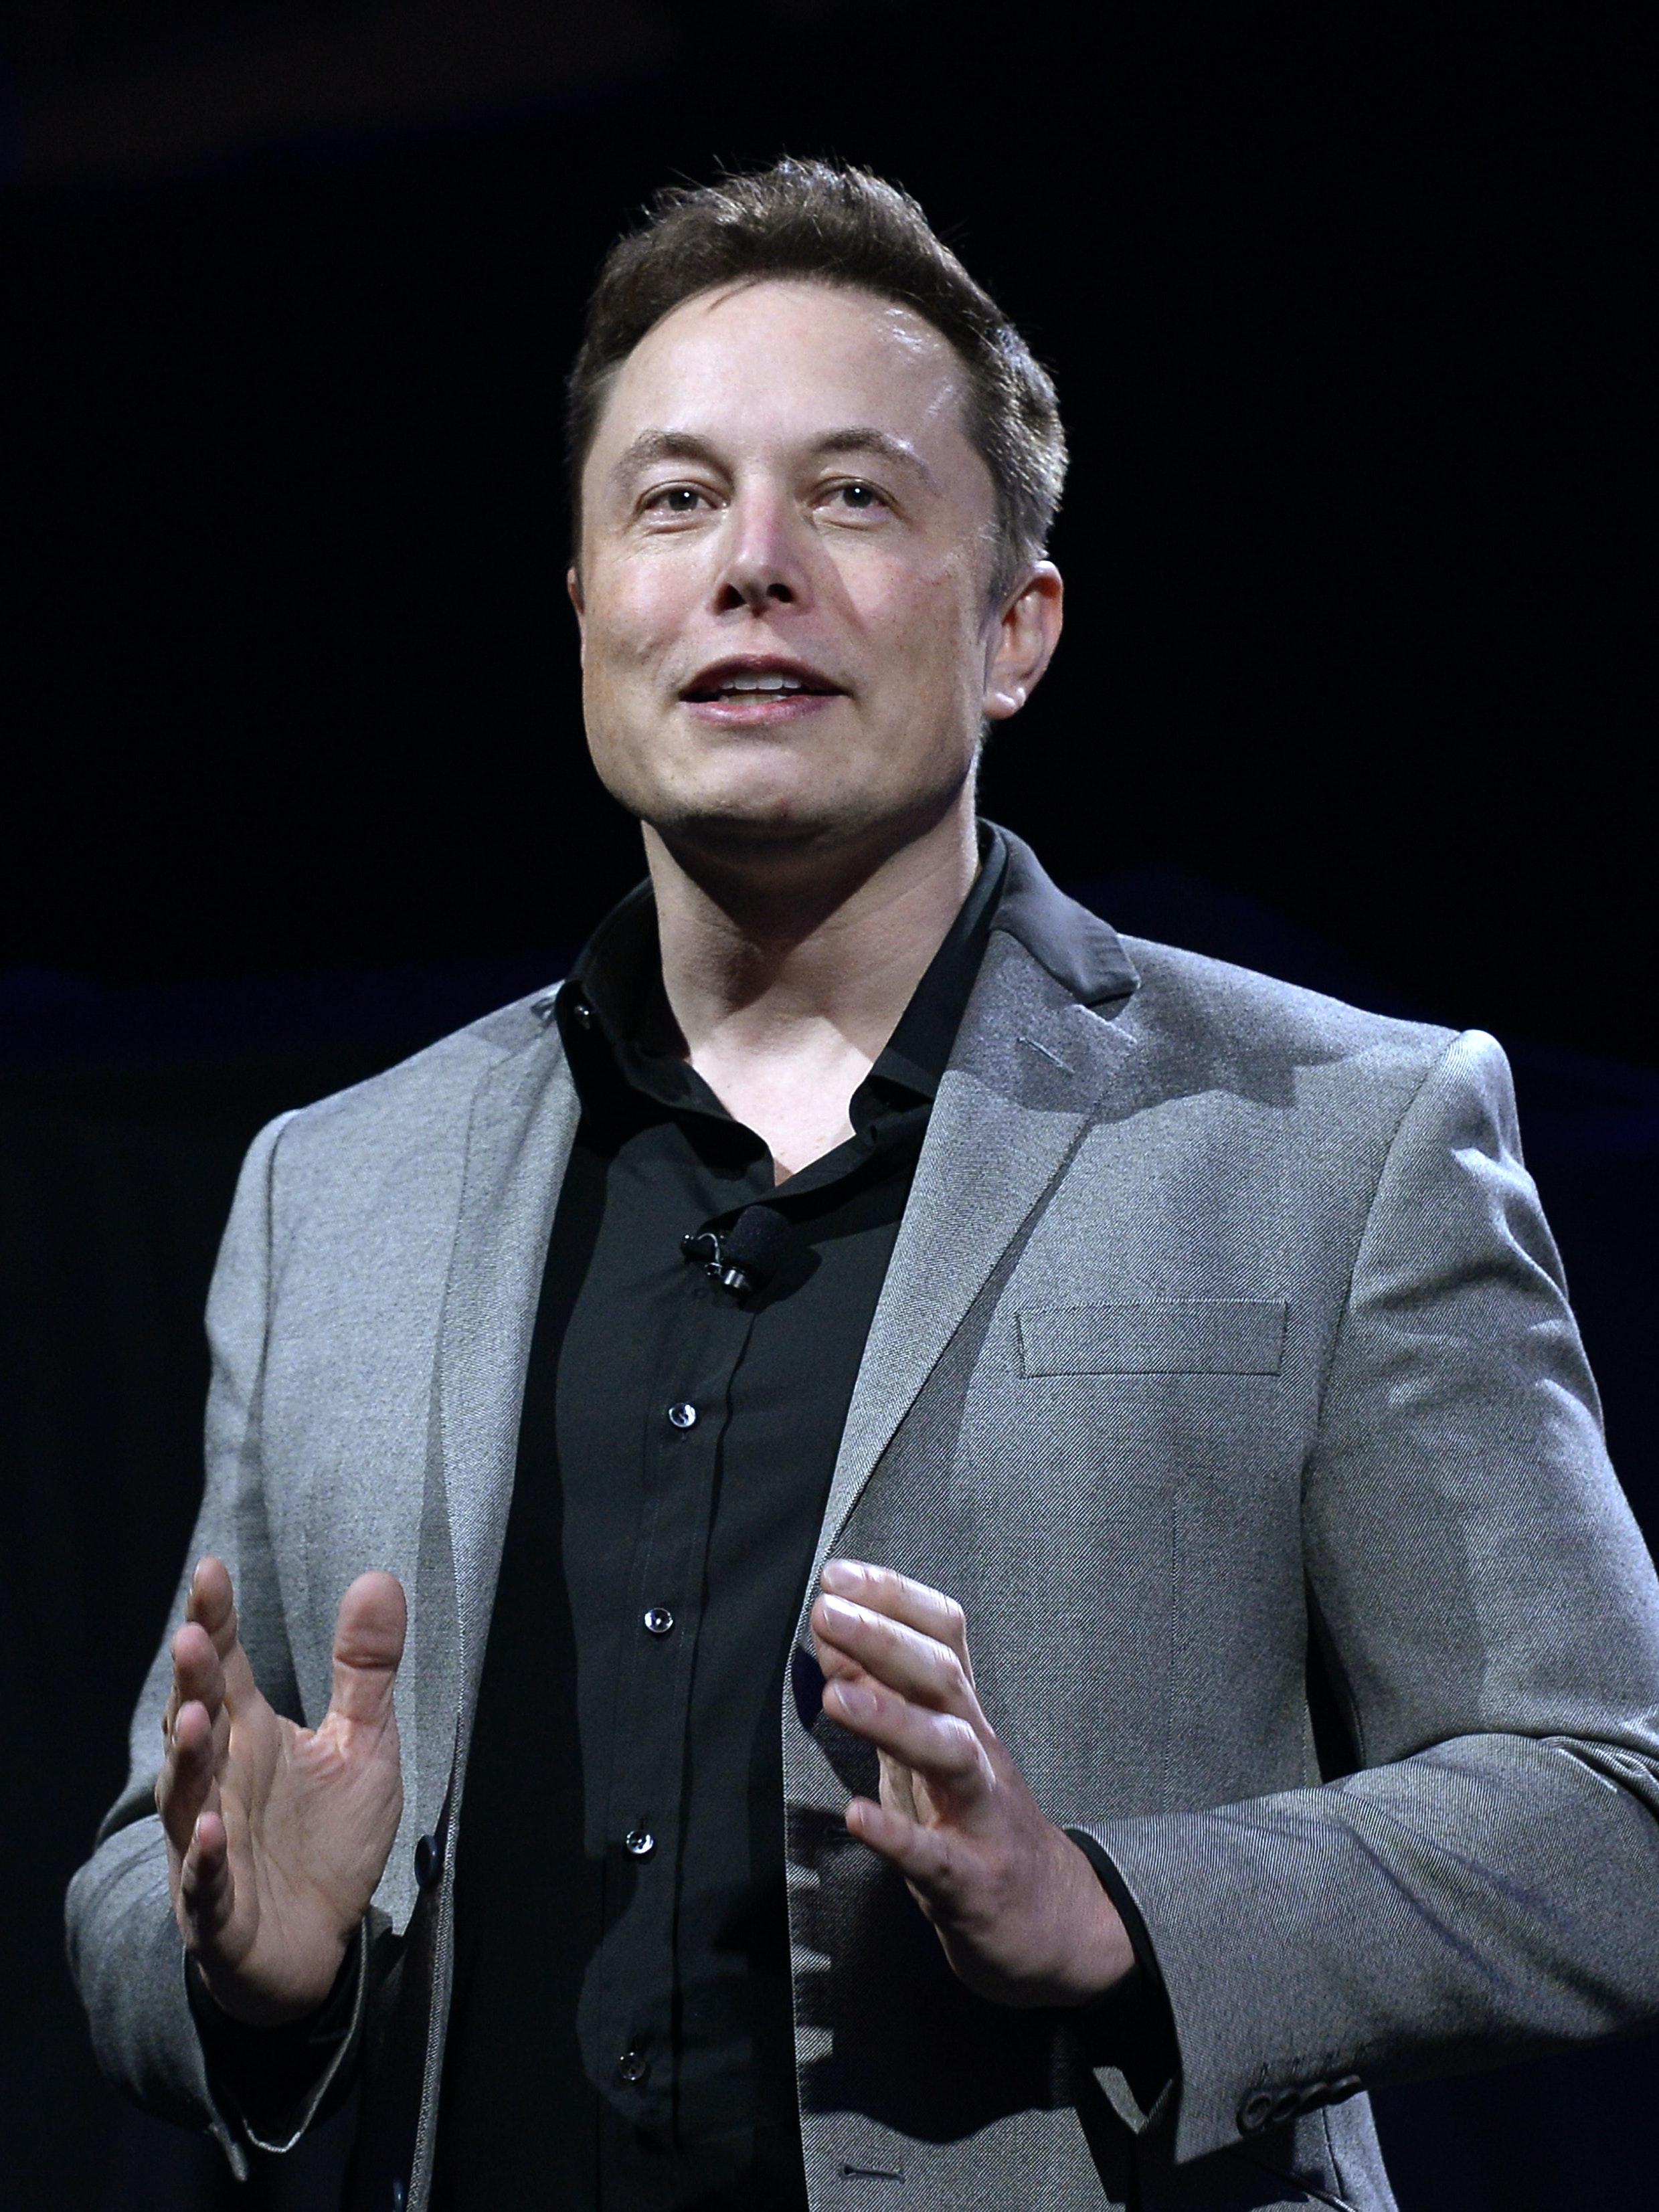 Here's a recap of Elon Musk's crazy 2015